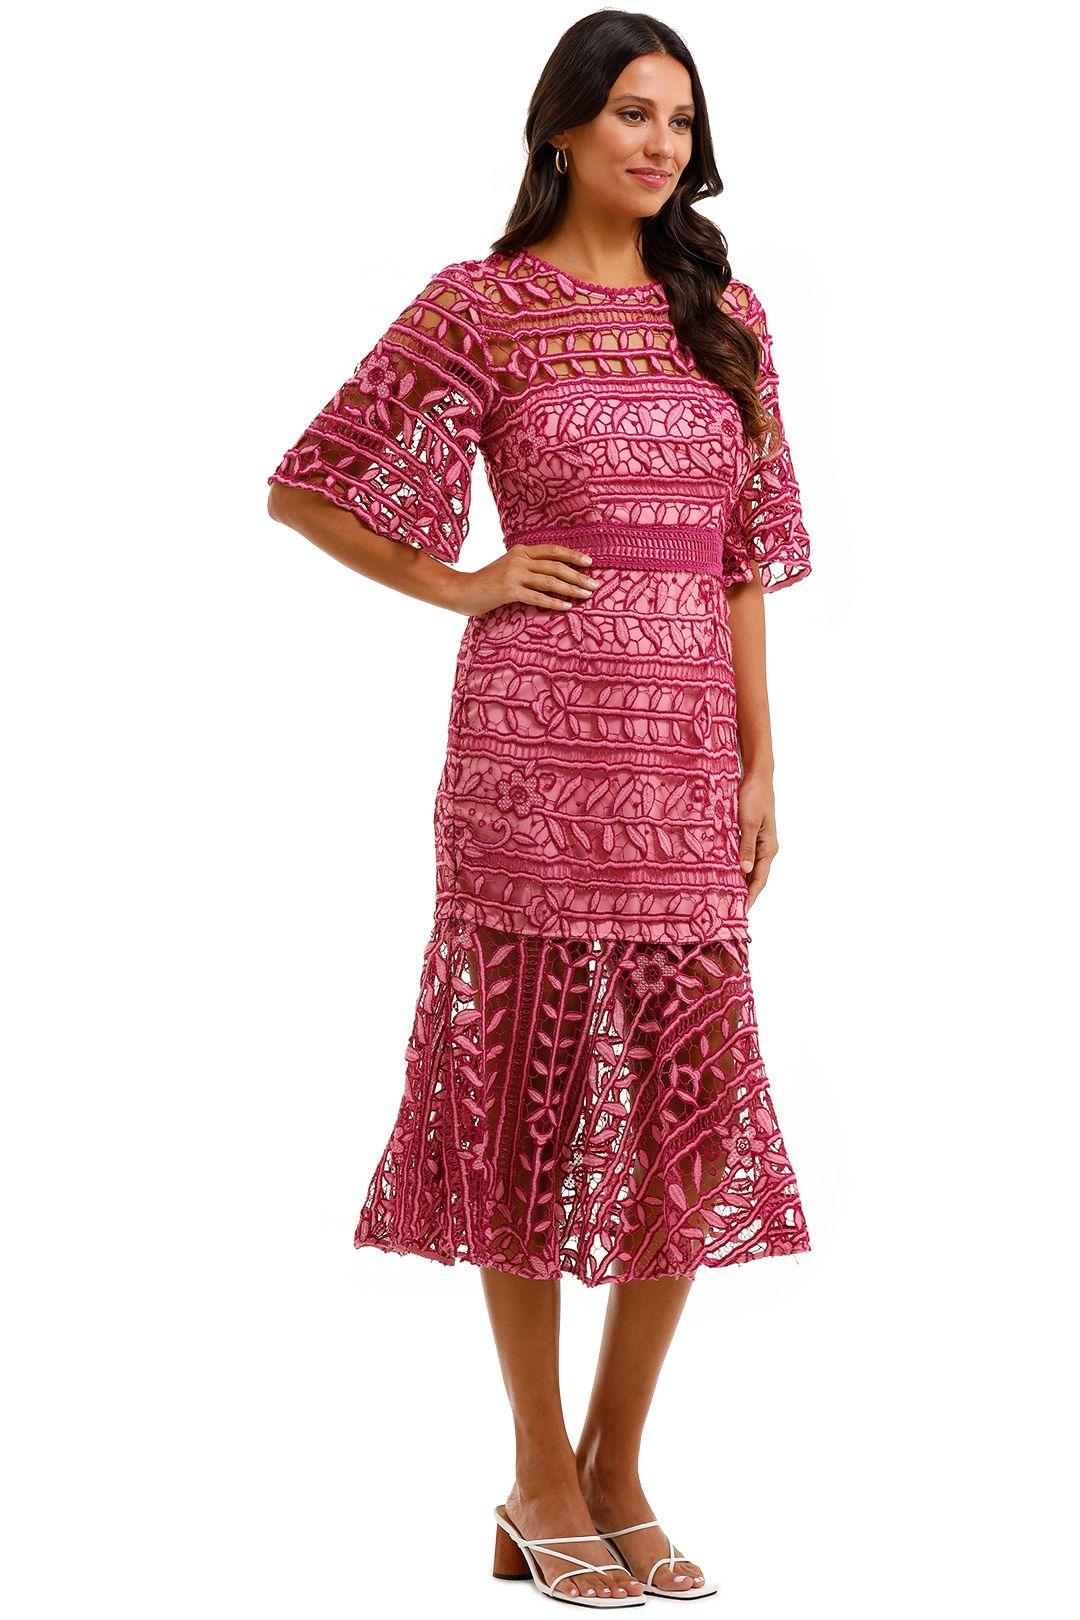 Talulah Caprice Midi Dress Pink Flare Sleeves